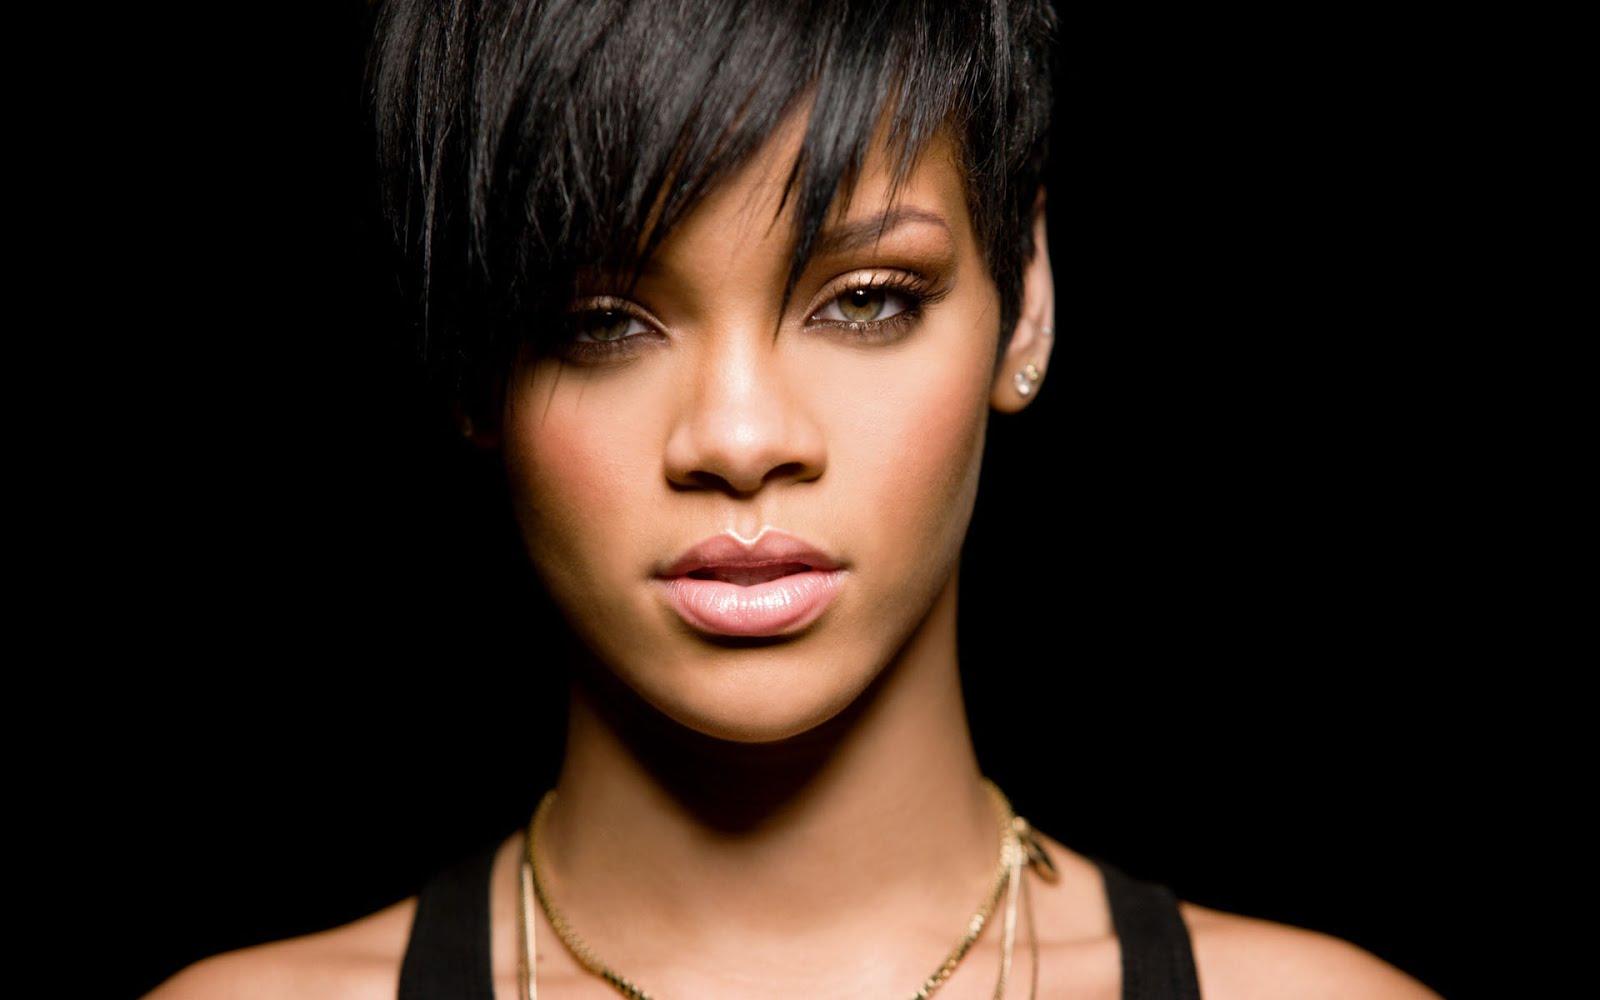 Vídeo clipe Rihanna cantando Diamonds, imperdível